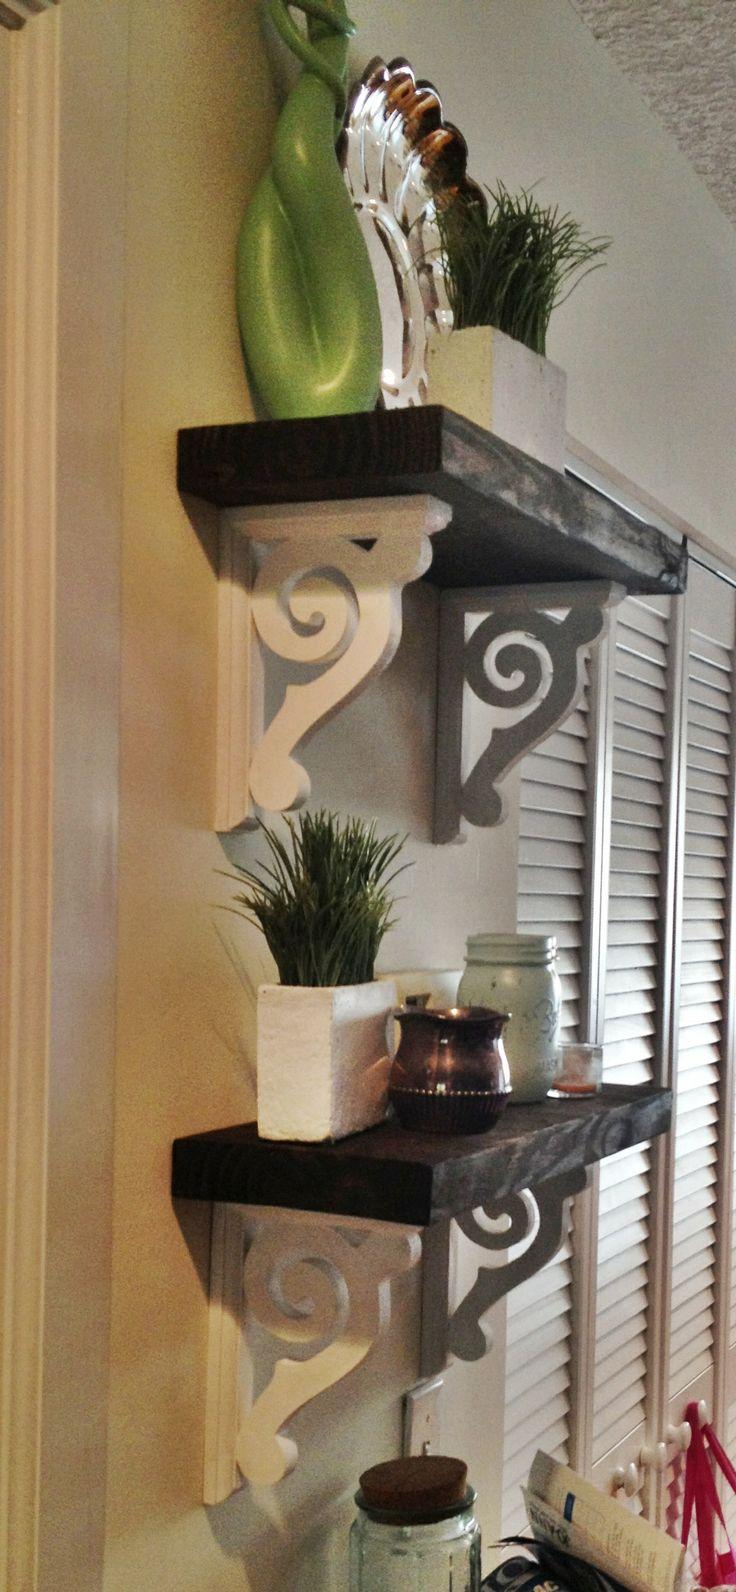 17 best ideas about tv brackets on pinterest tv wall. Black Bedroom Furniture Sets. Home Design Ideas